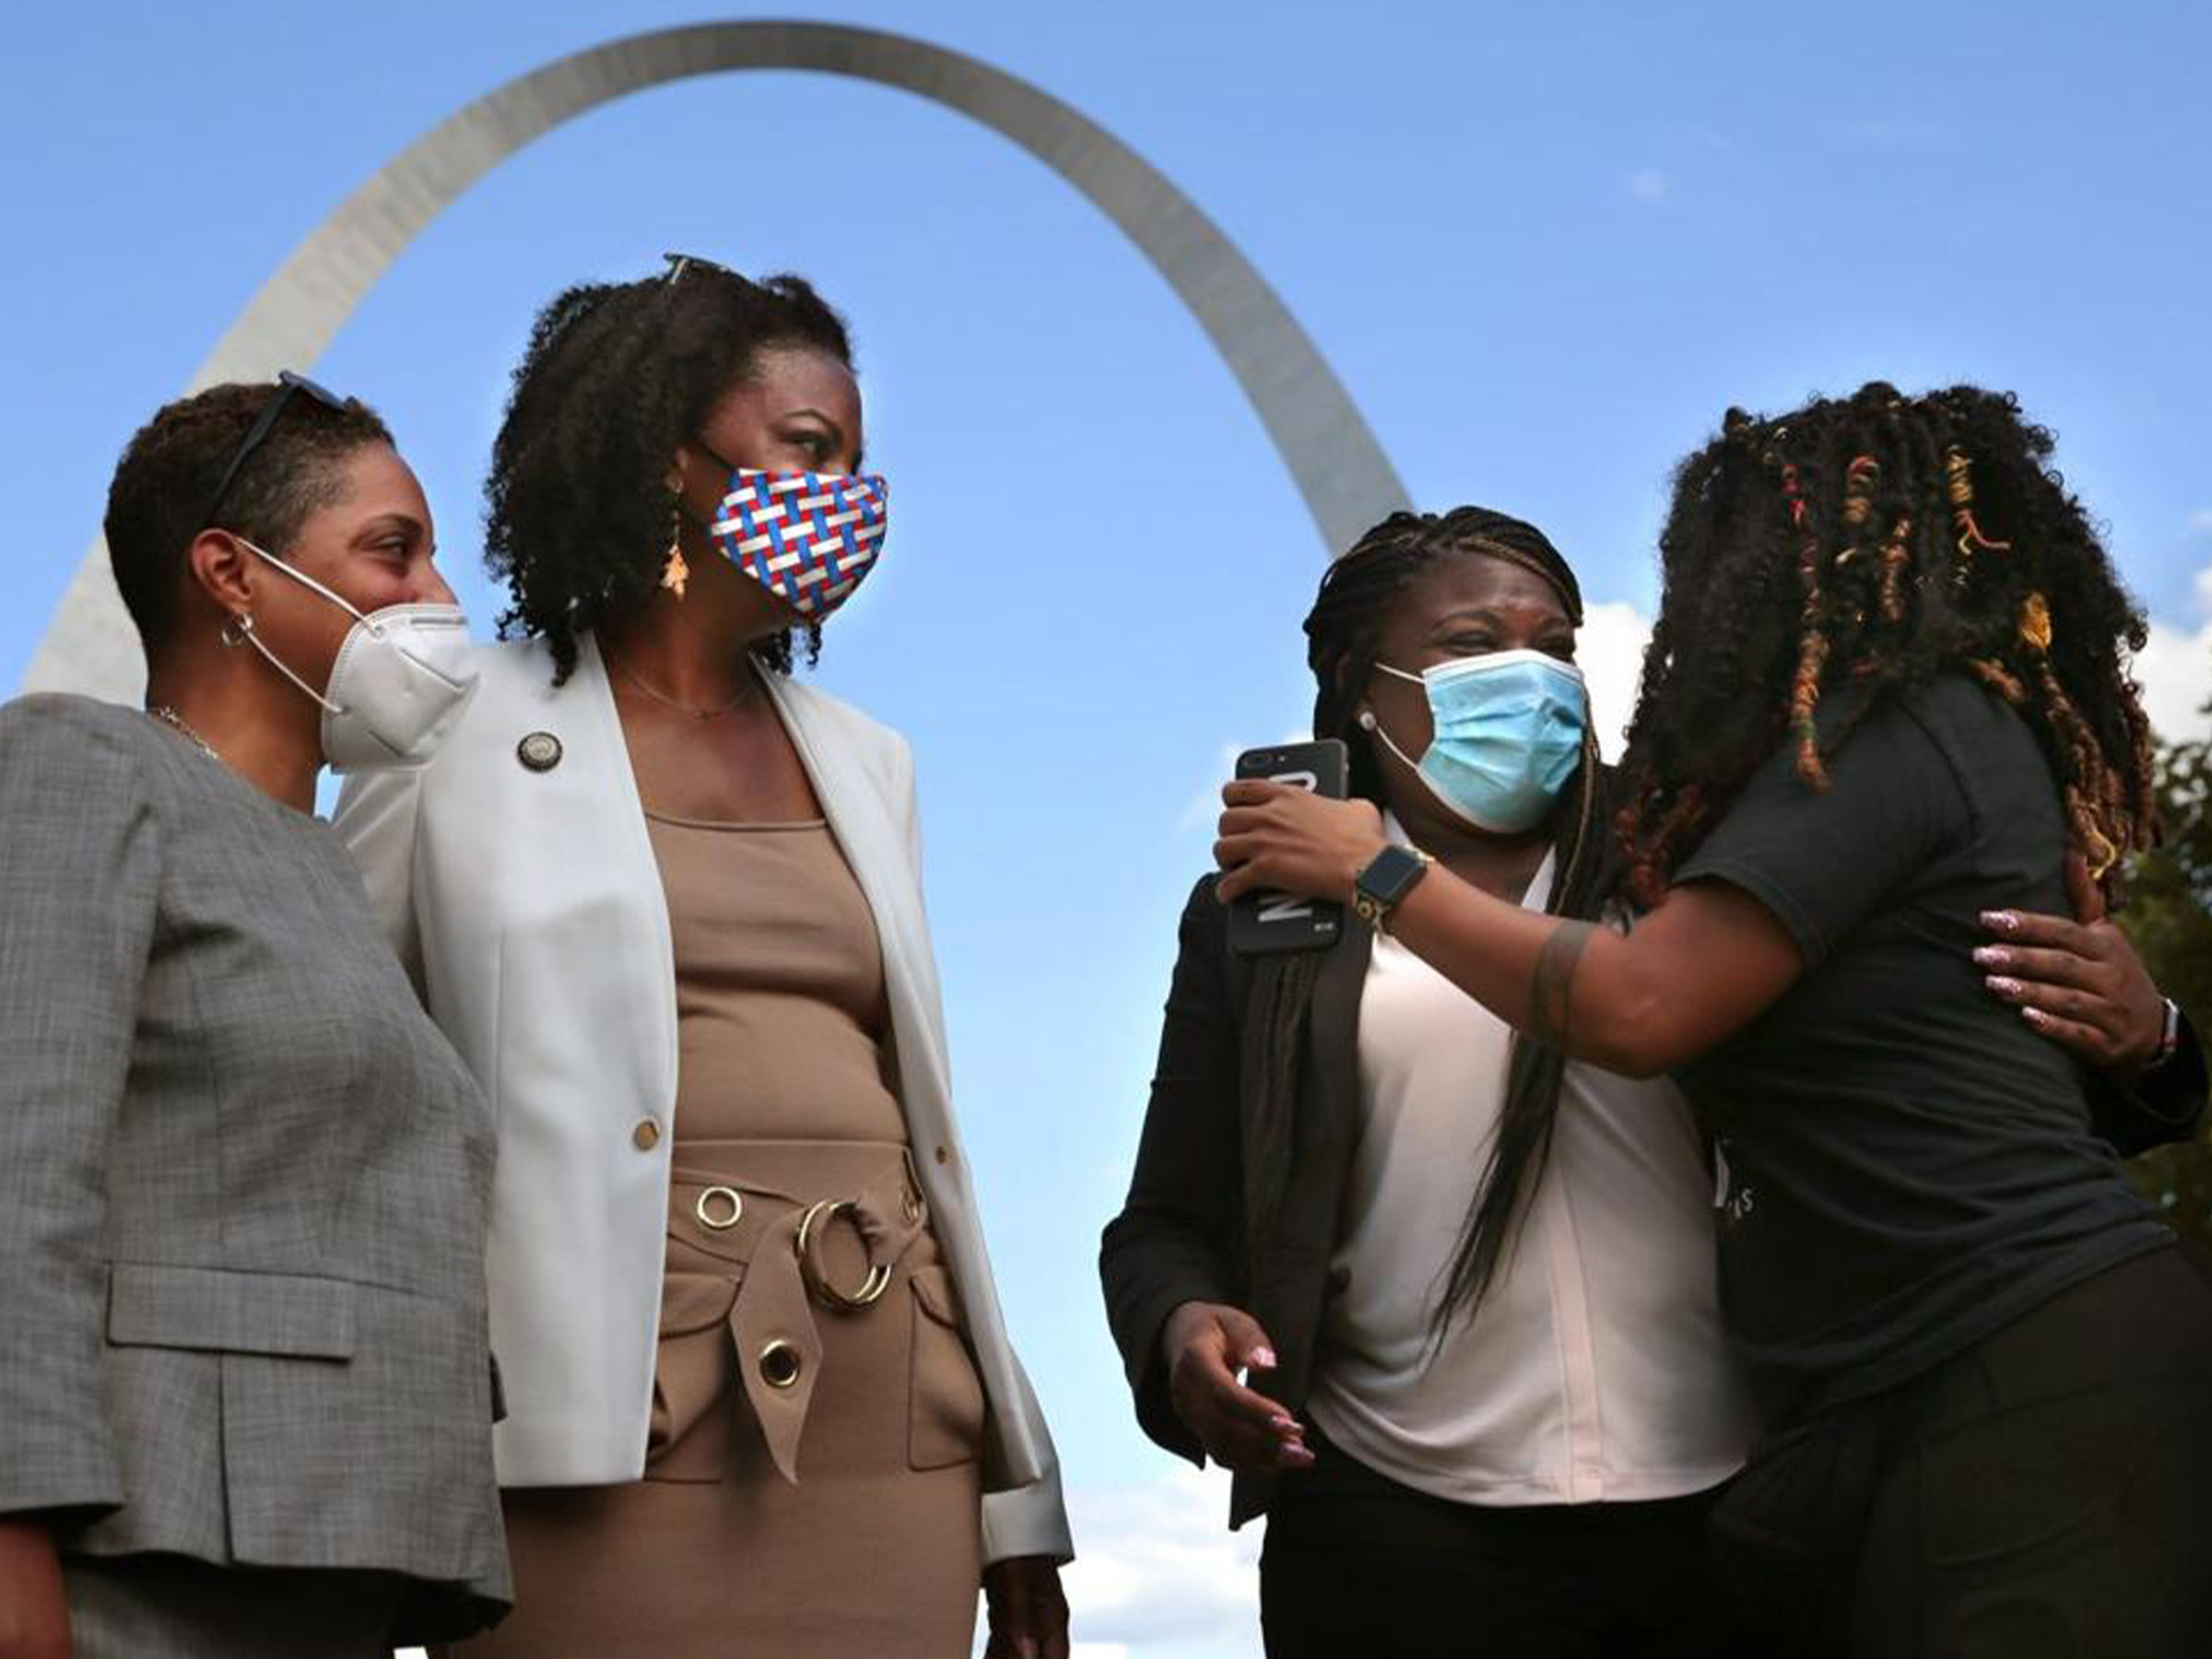 Bush, Jones, Gardner part of 'wave' of success by Black women candidates in Missouri